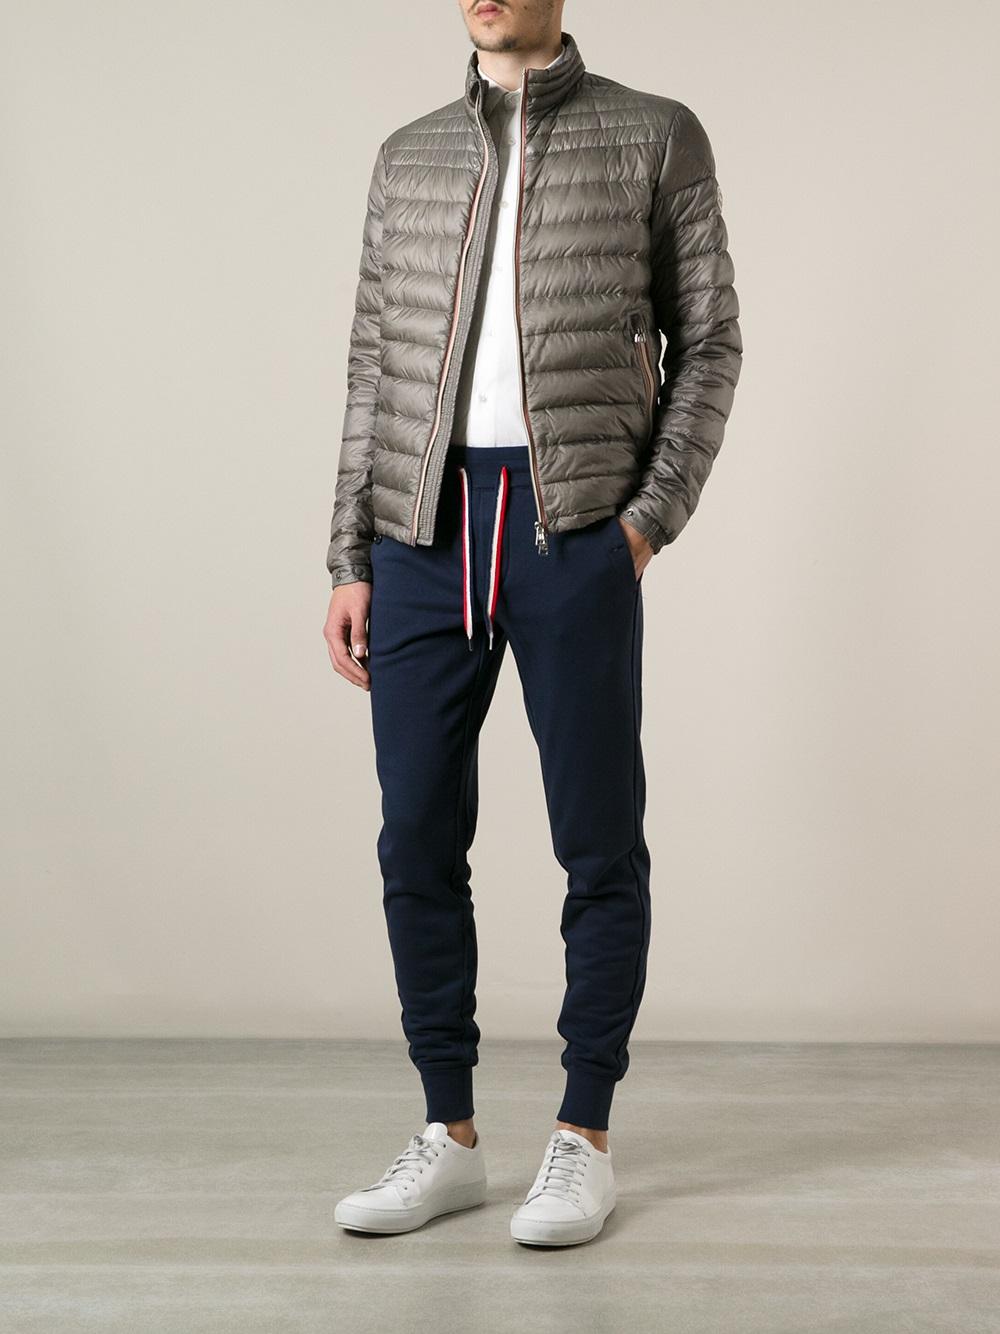 moncler jacket daniel